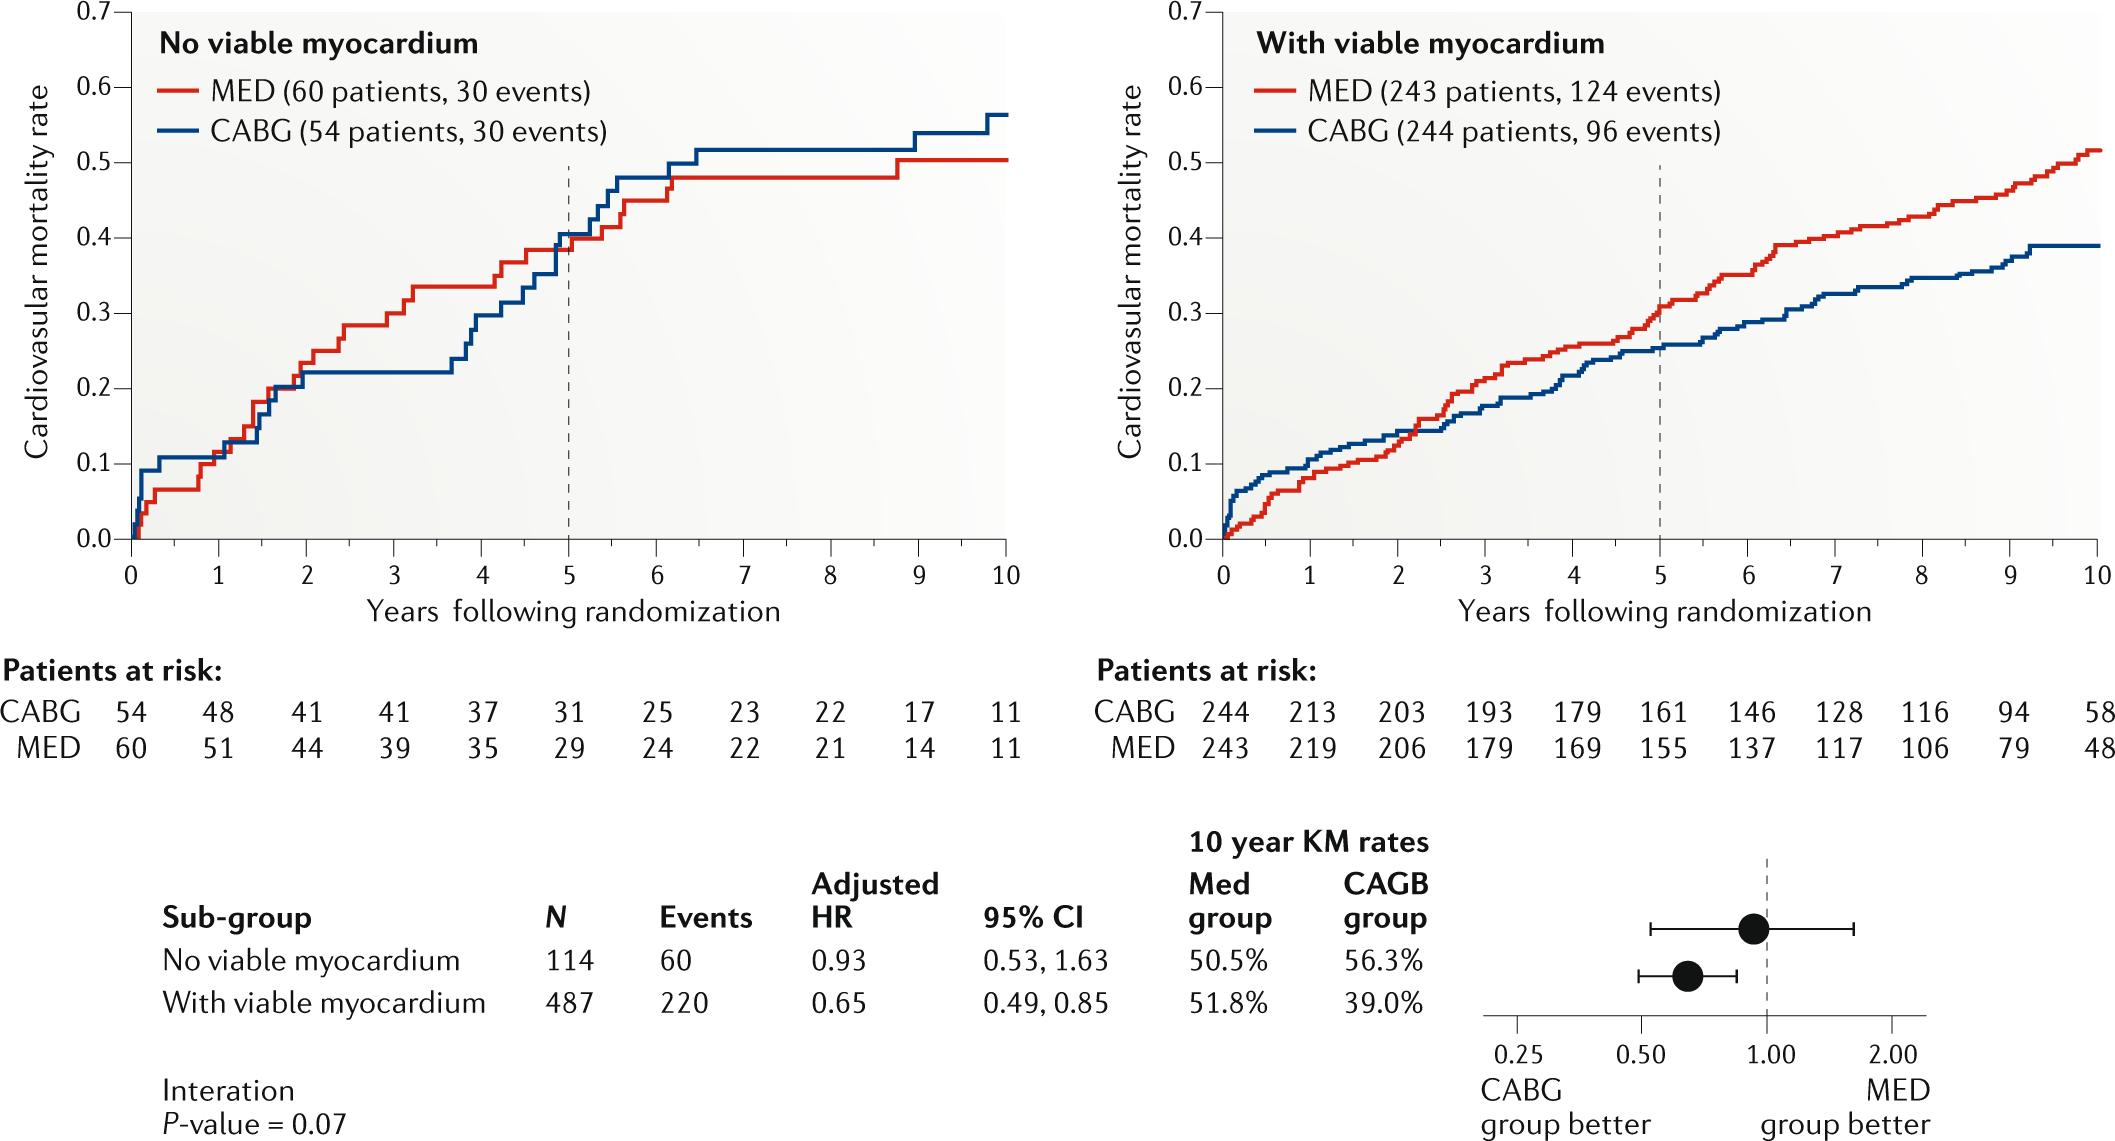 Myocardial viability and CABG surgery: a Bayesian appraisal of STICH